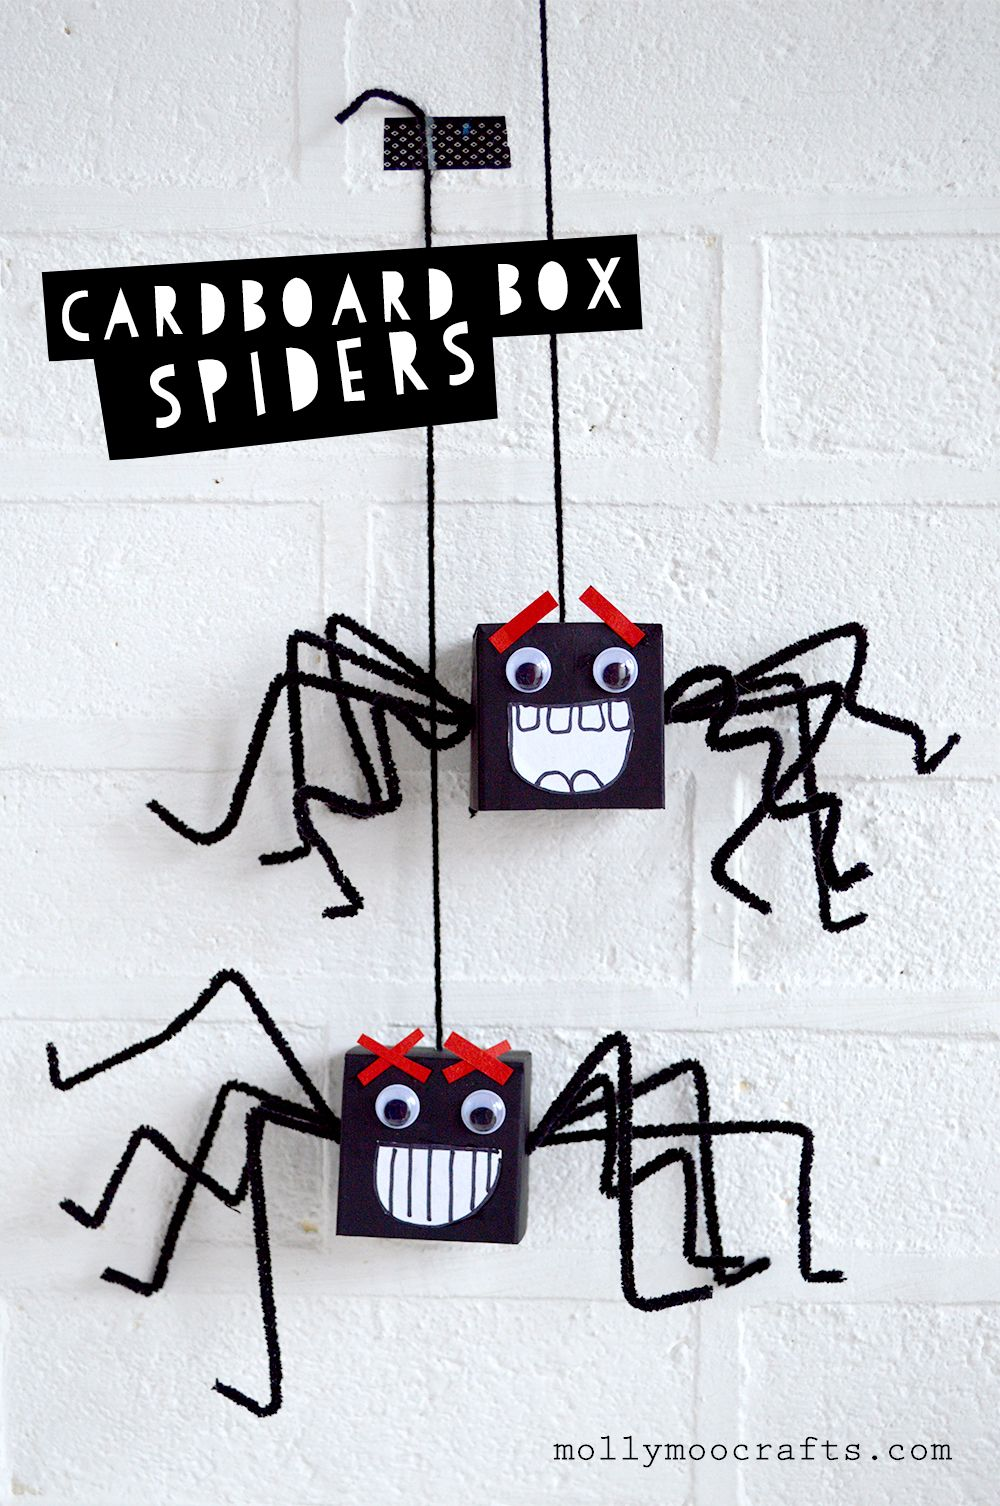 cardboard box spiders halloween craft fun for kids